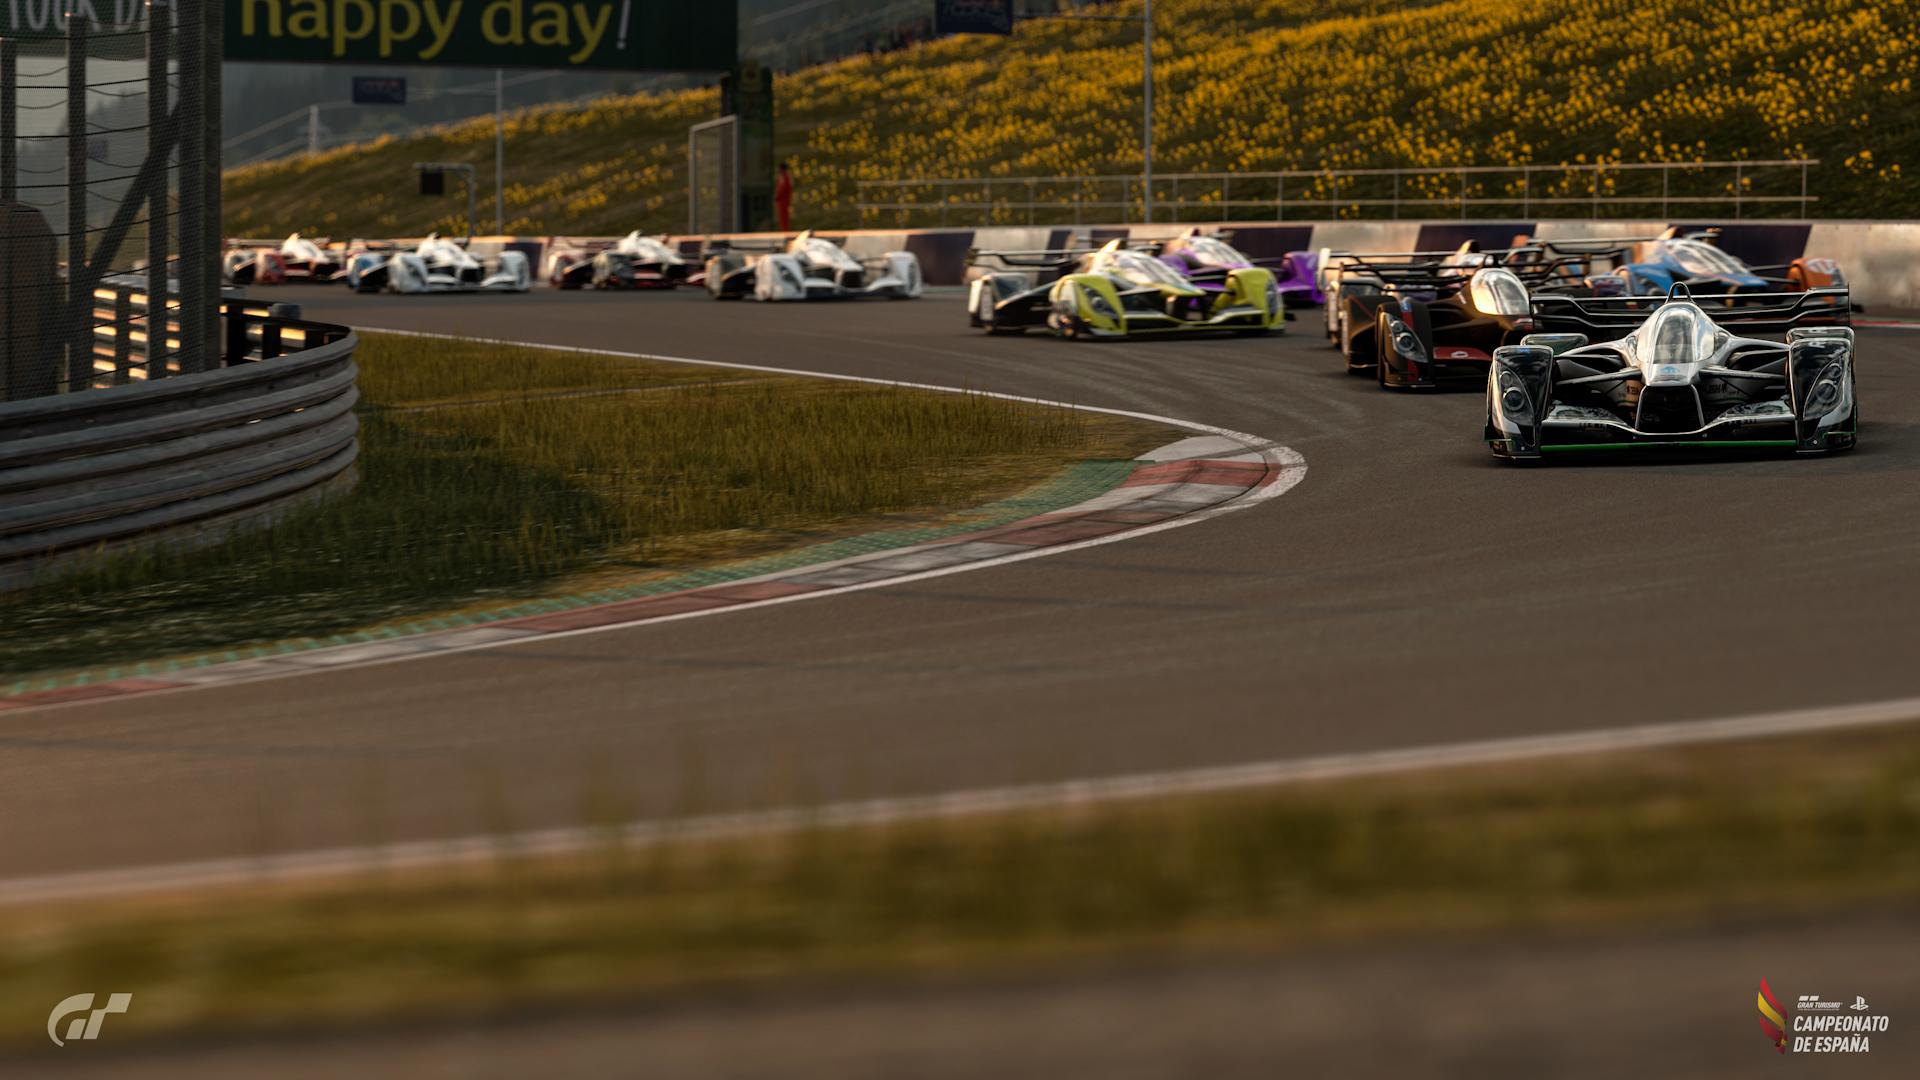 Campeonato de España de Gran Turismo